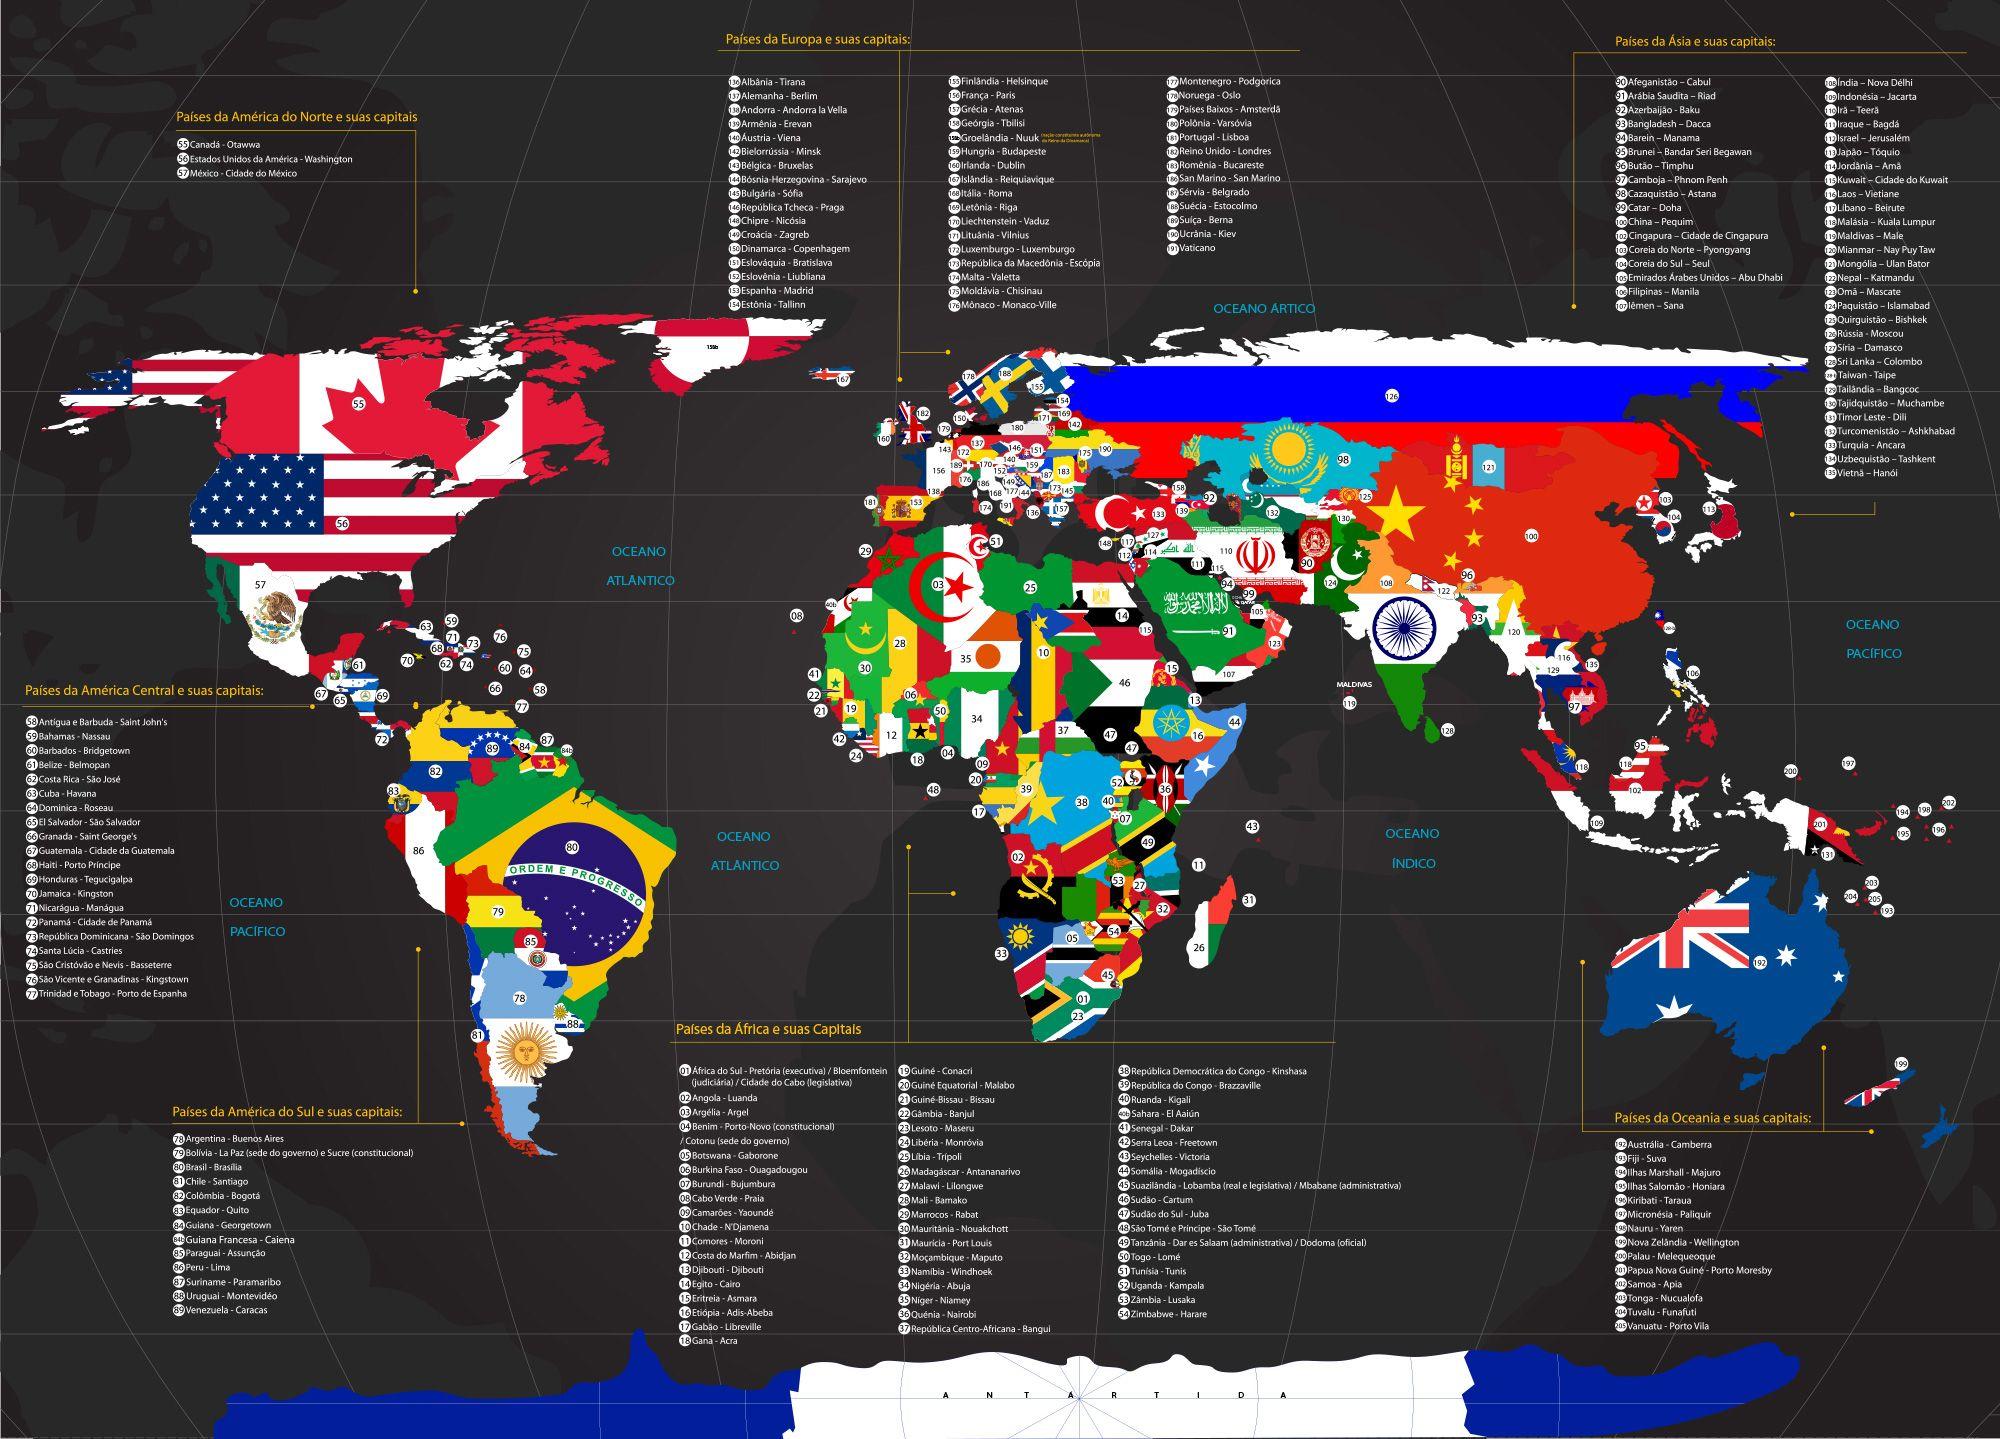 418b8fbef1f4e adesivo mapa mundi com as bandeiras dos países